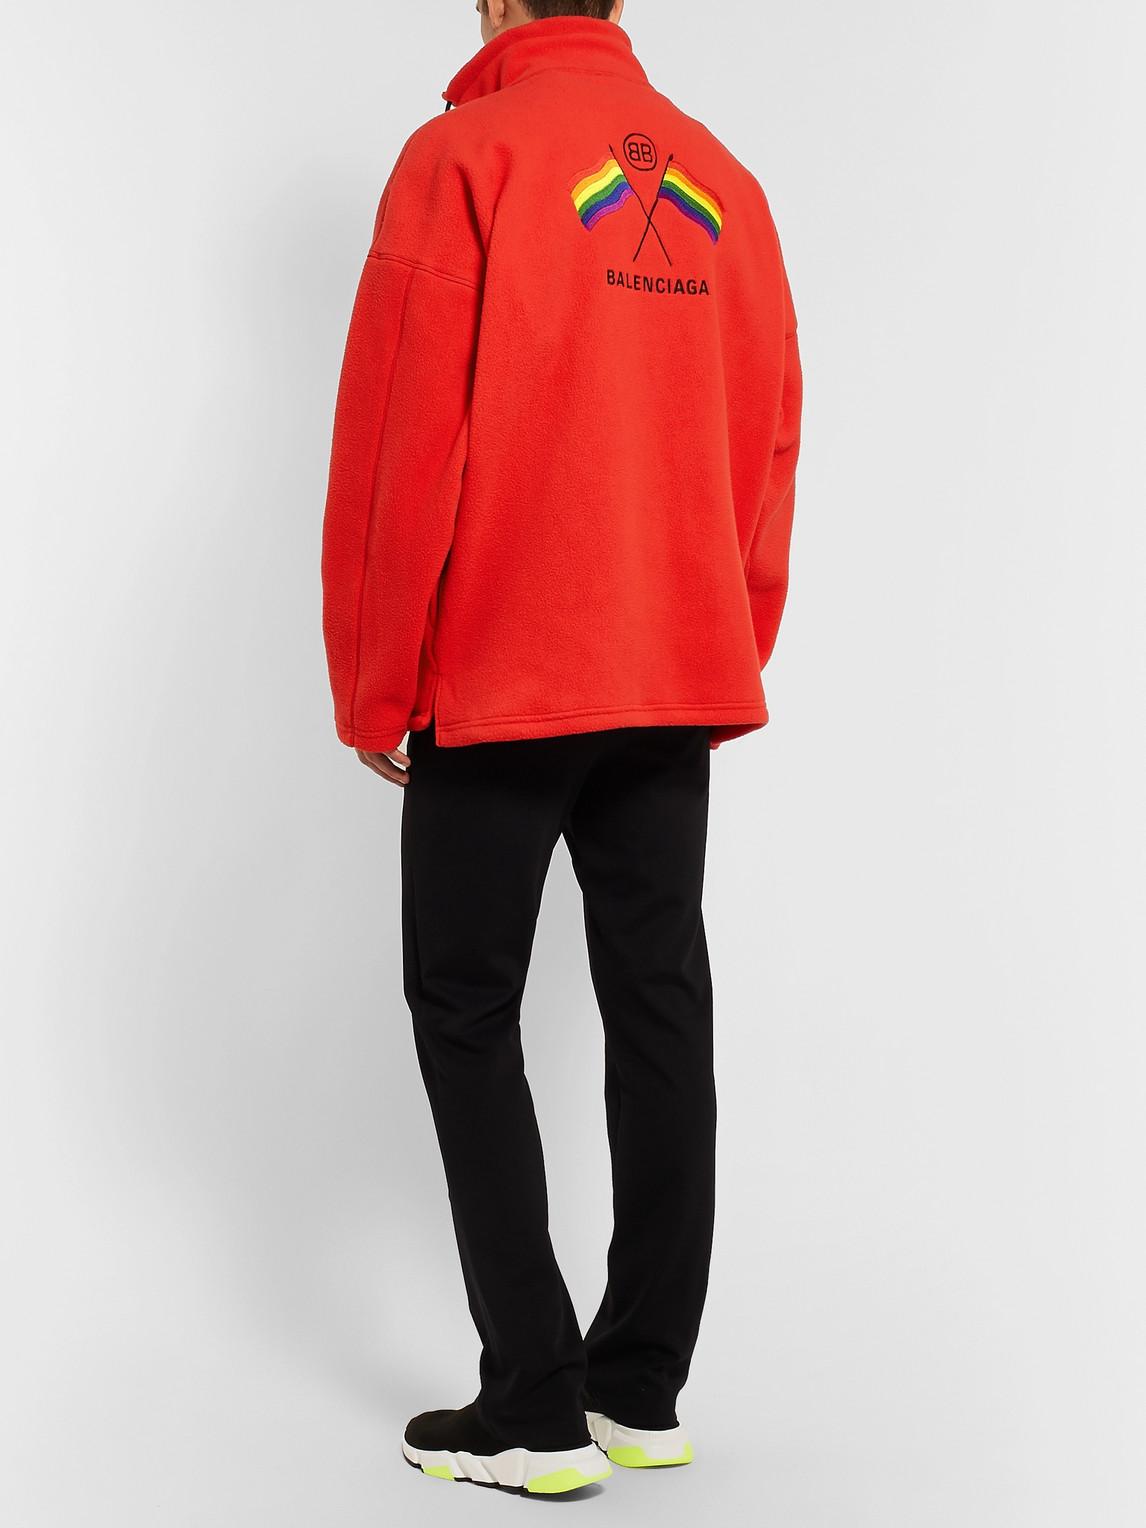 Balenciaga Jackets OVERSIZED EMBROIDERED FLEECE JACKET